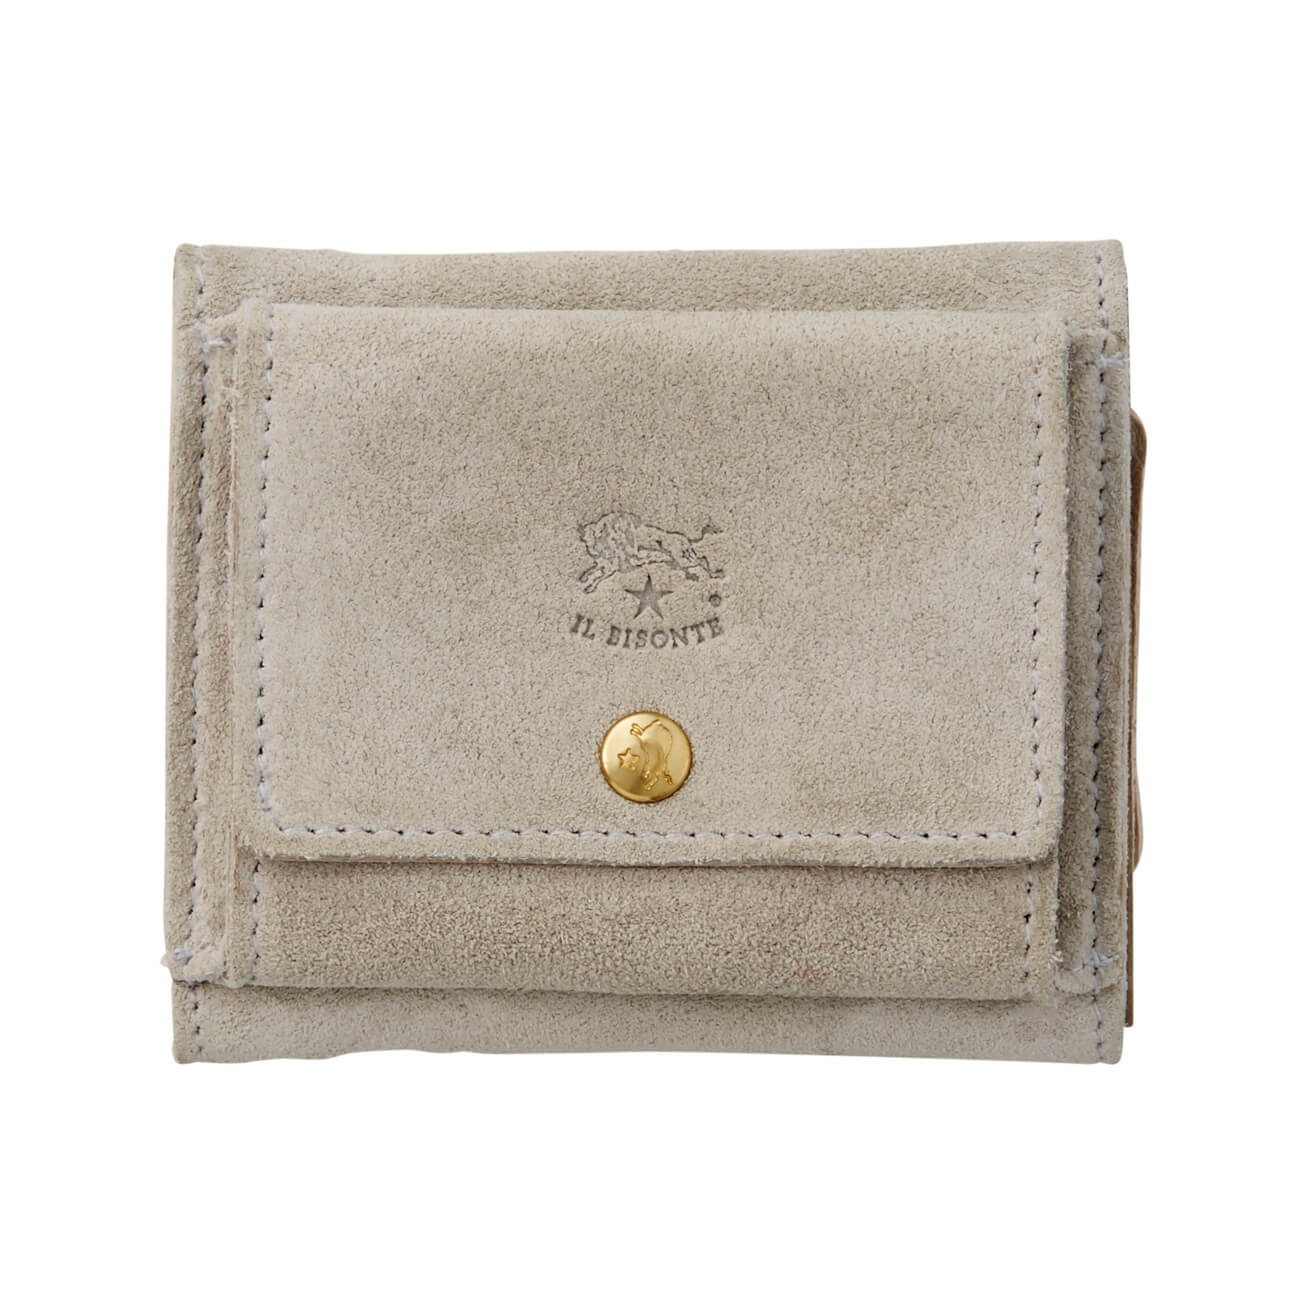 IL BISONTE (イル ビゾンテ) 日本公式オンラインストア 折財布 54192312740